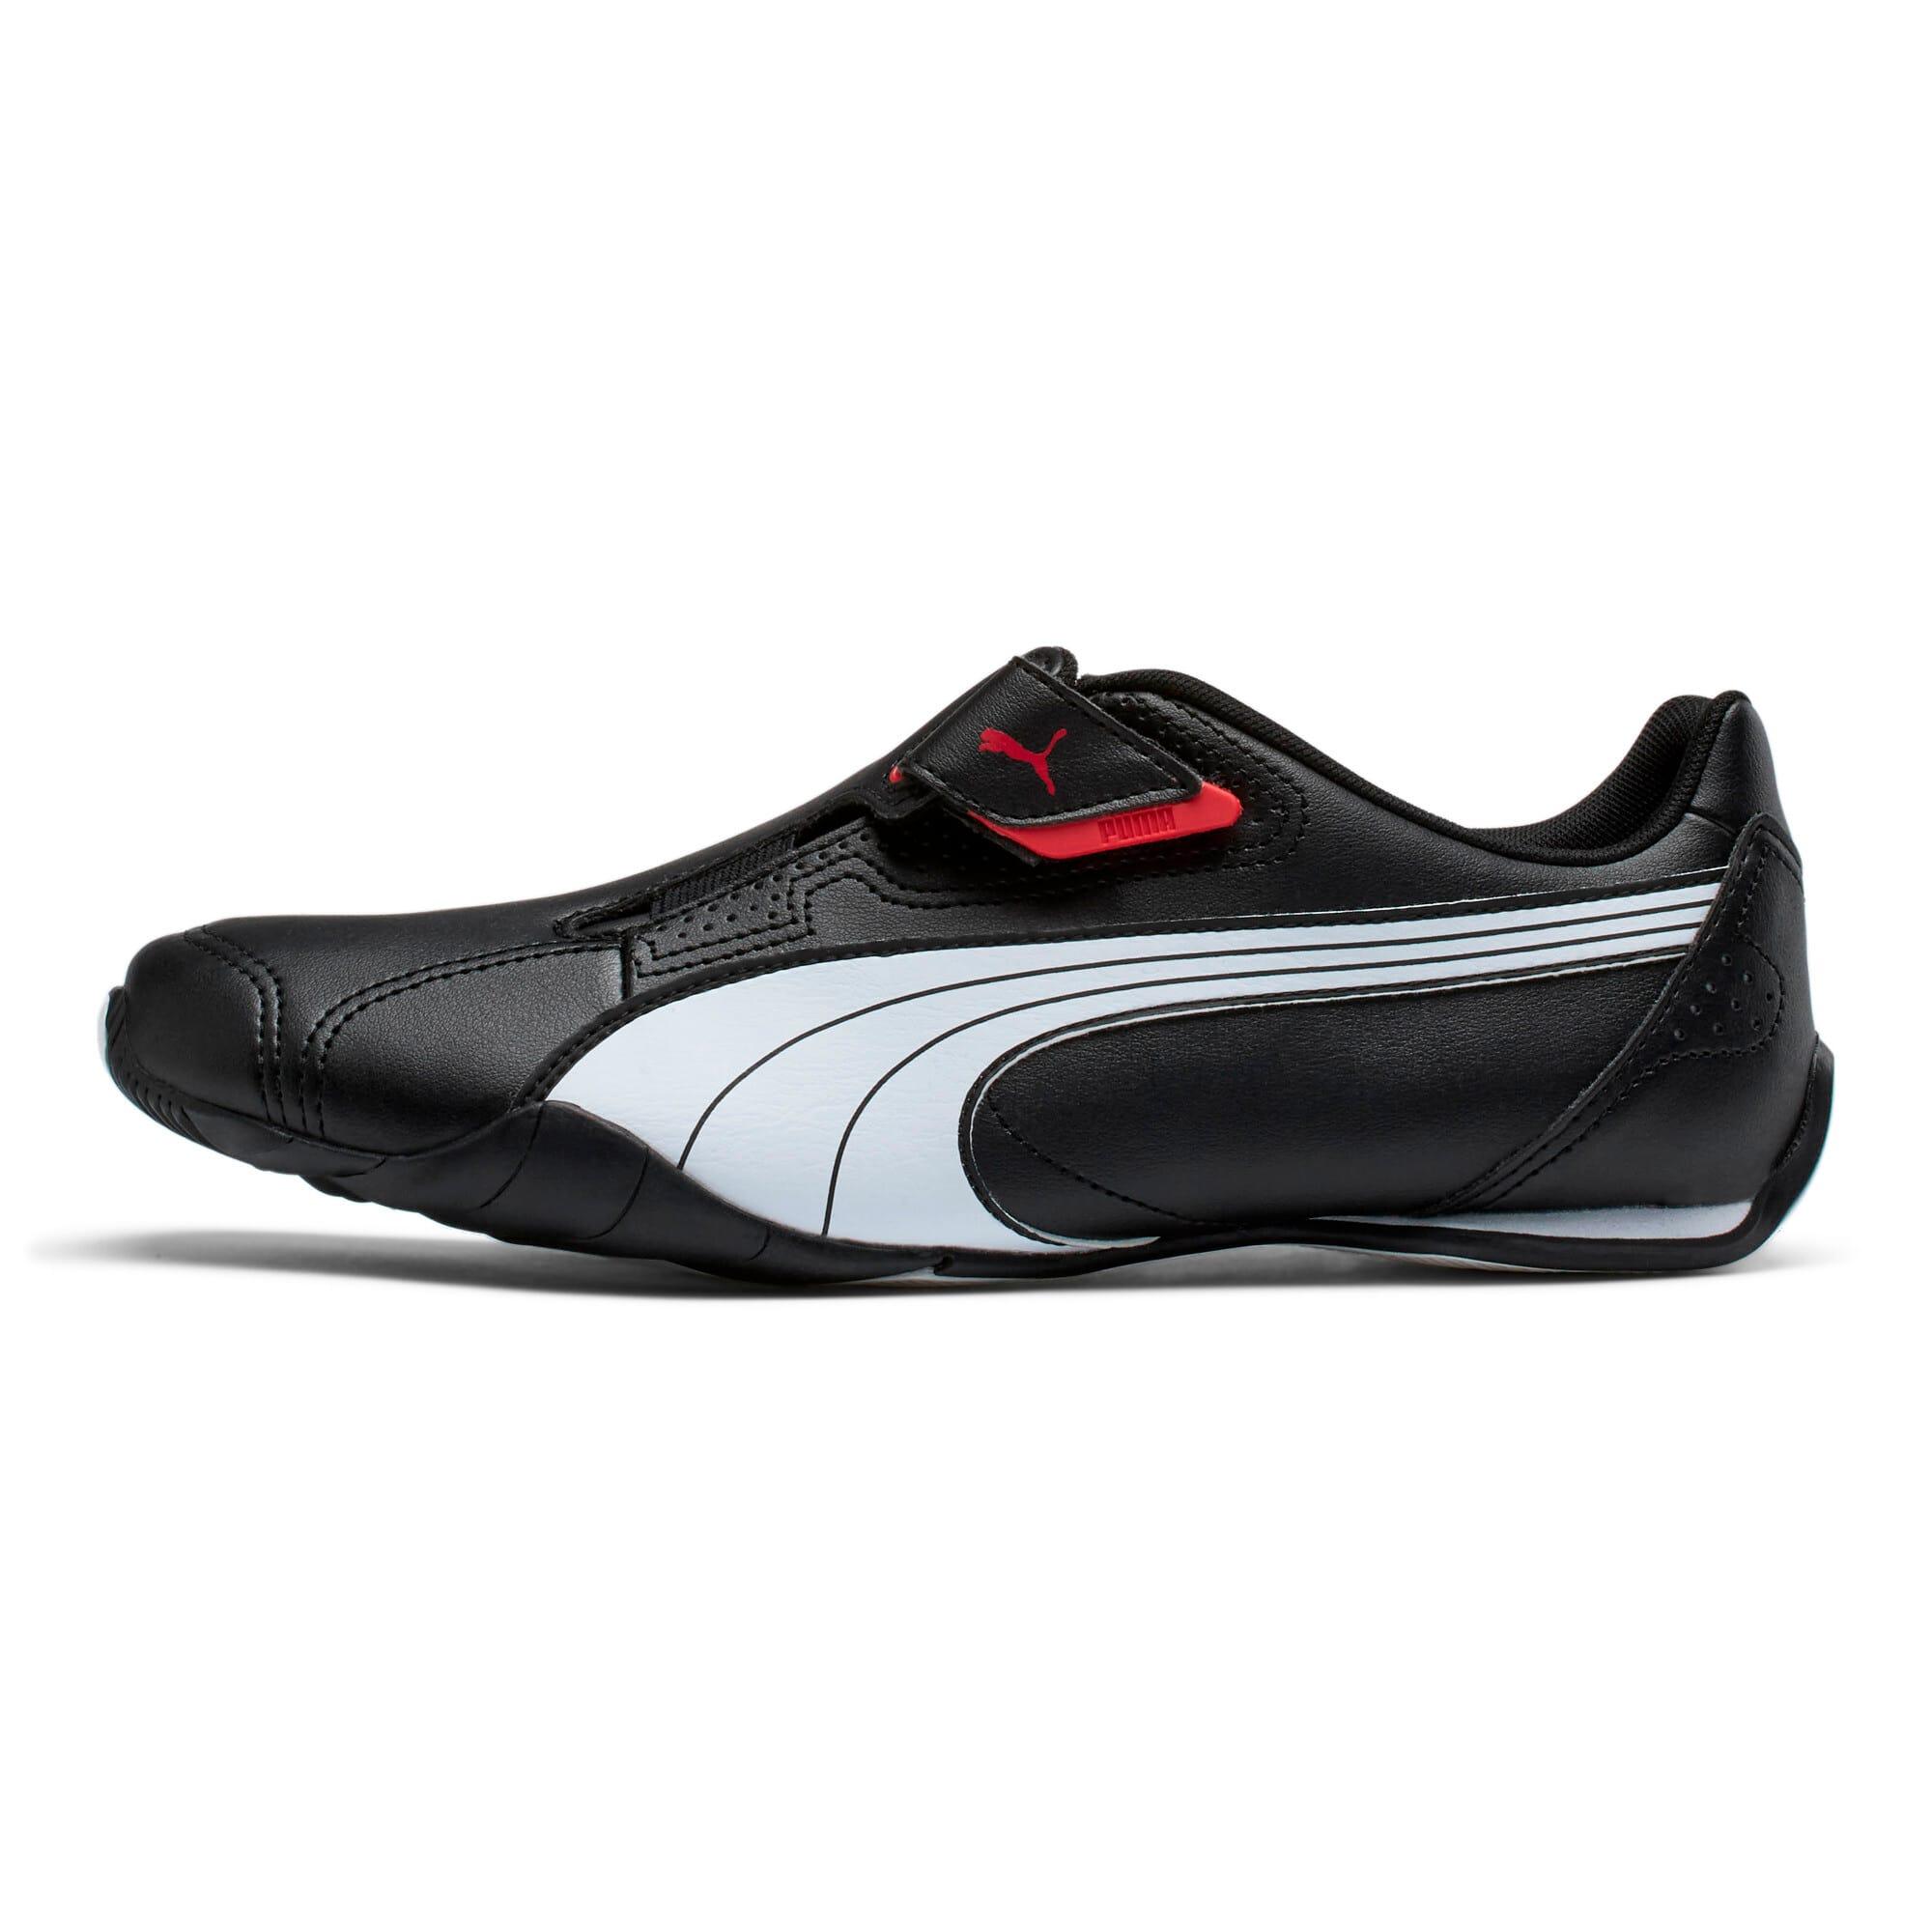 Official Puma Store: PUMA Redon Move Shoes Men Shoe Sport Shoe |